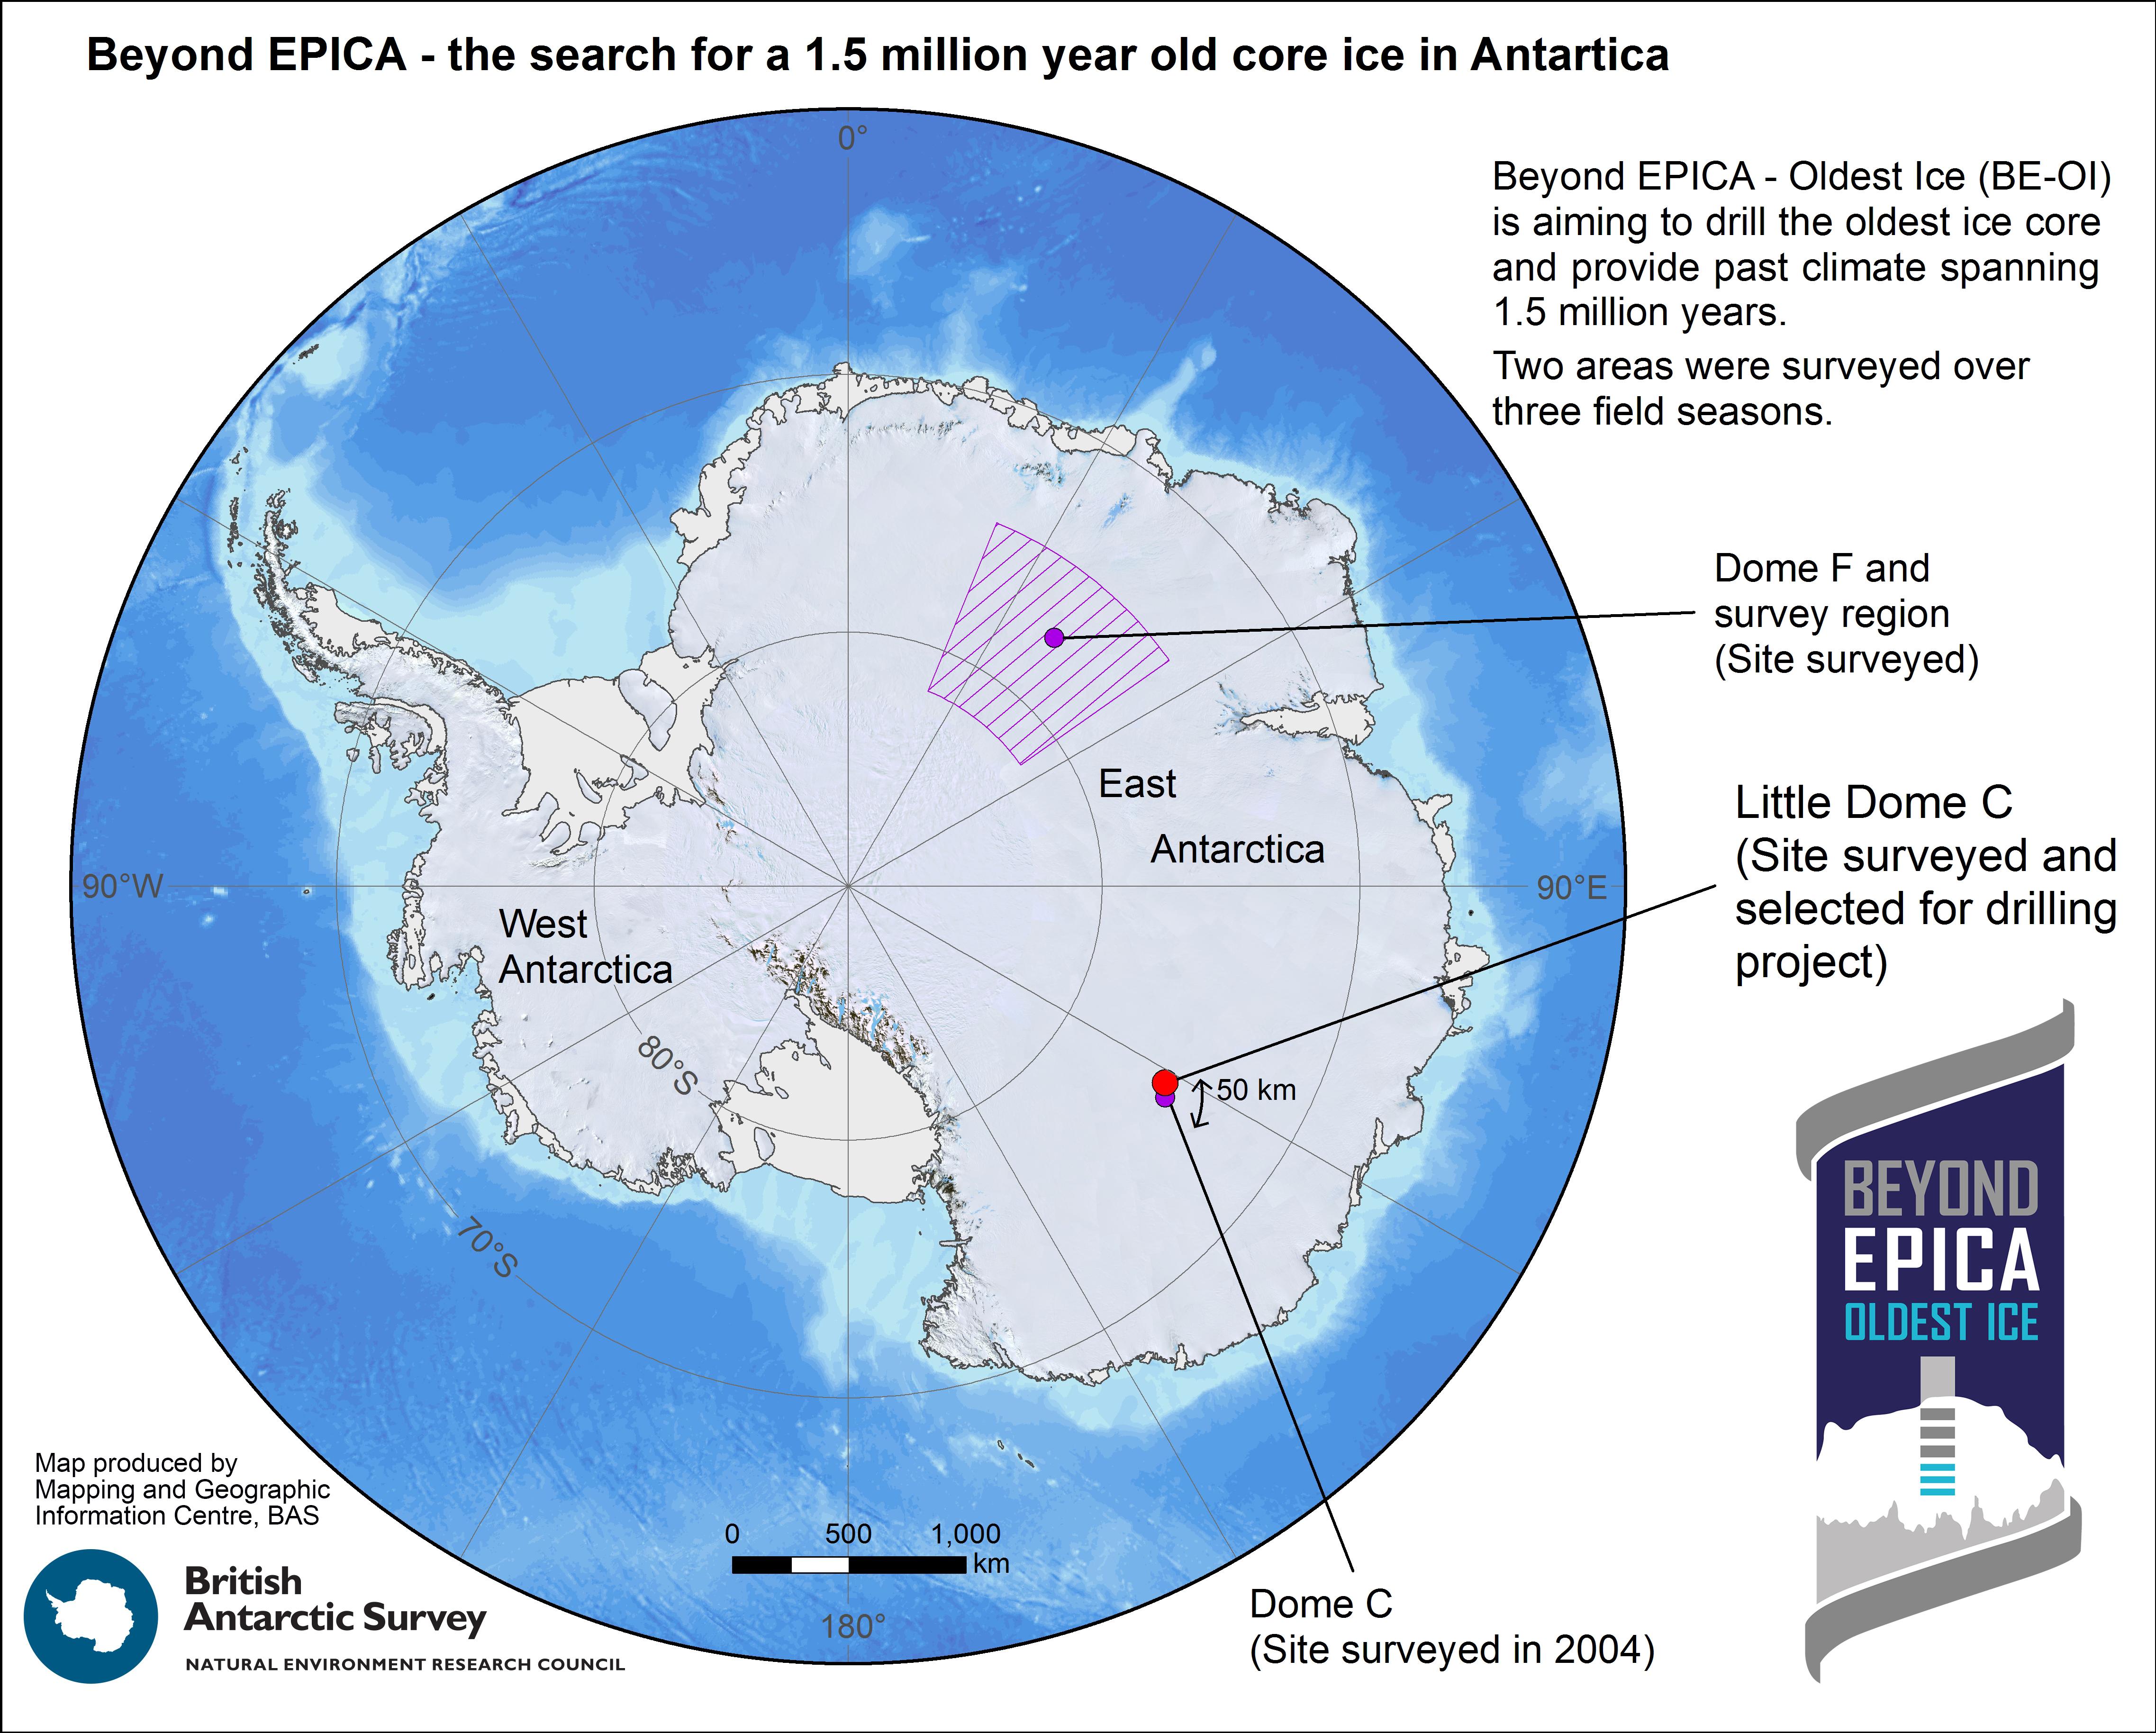 be-oi_map_antarctica.jpg